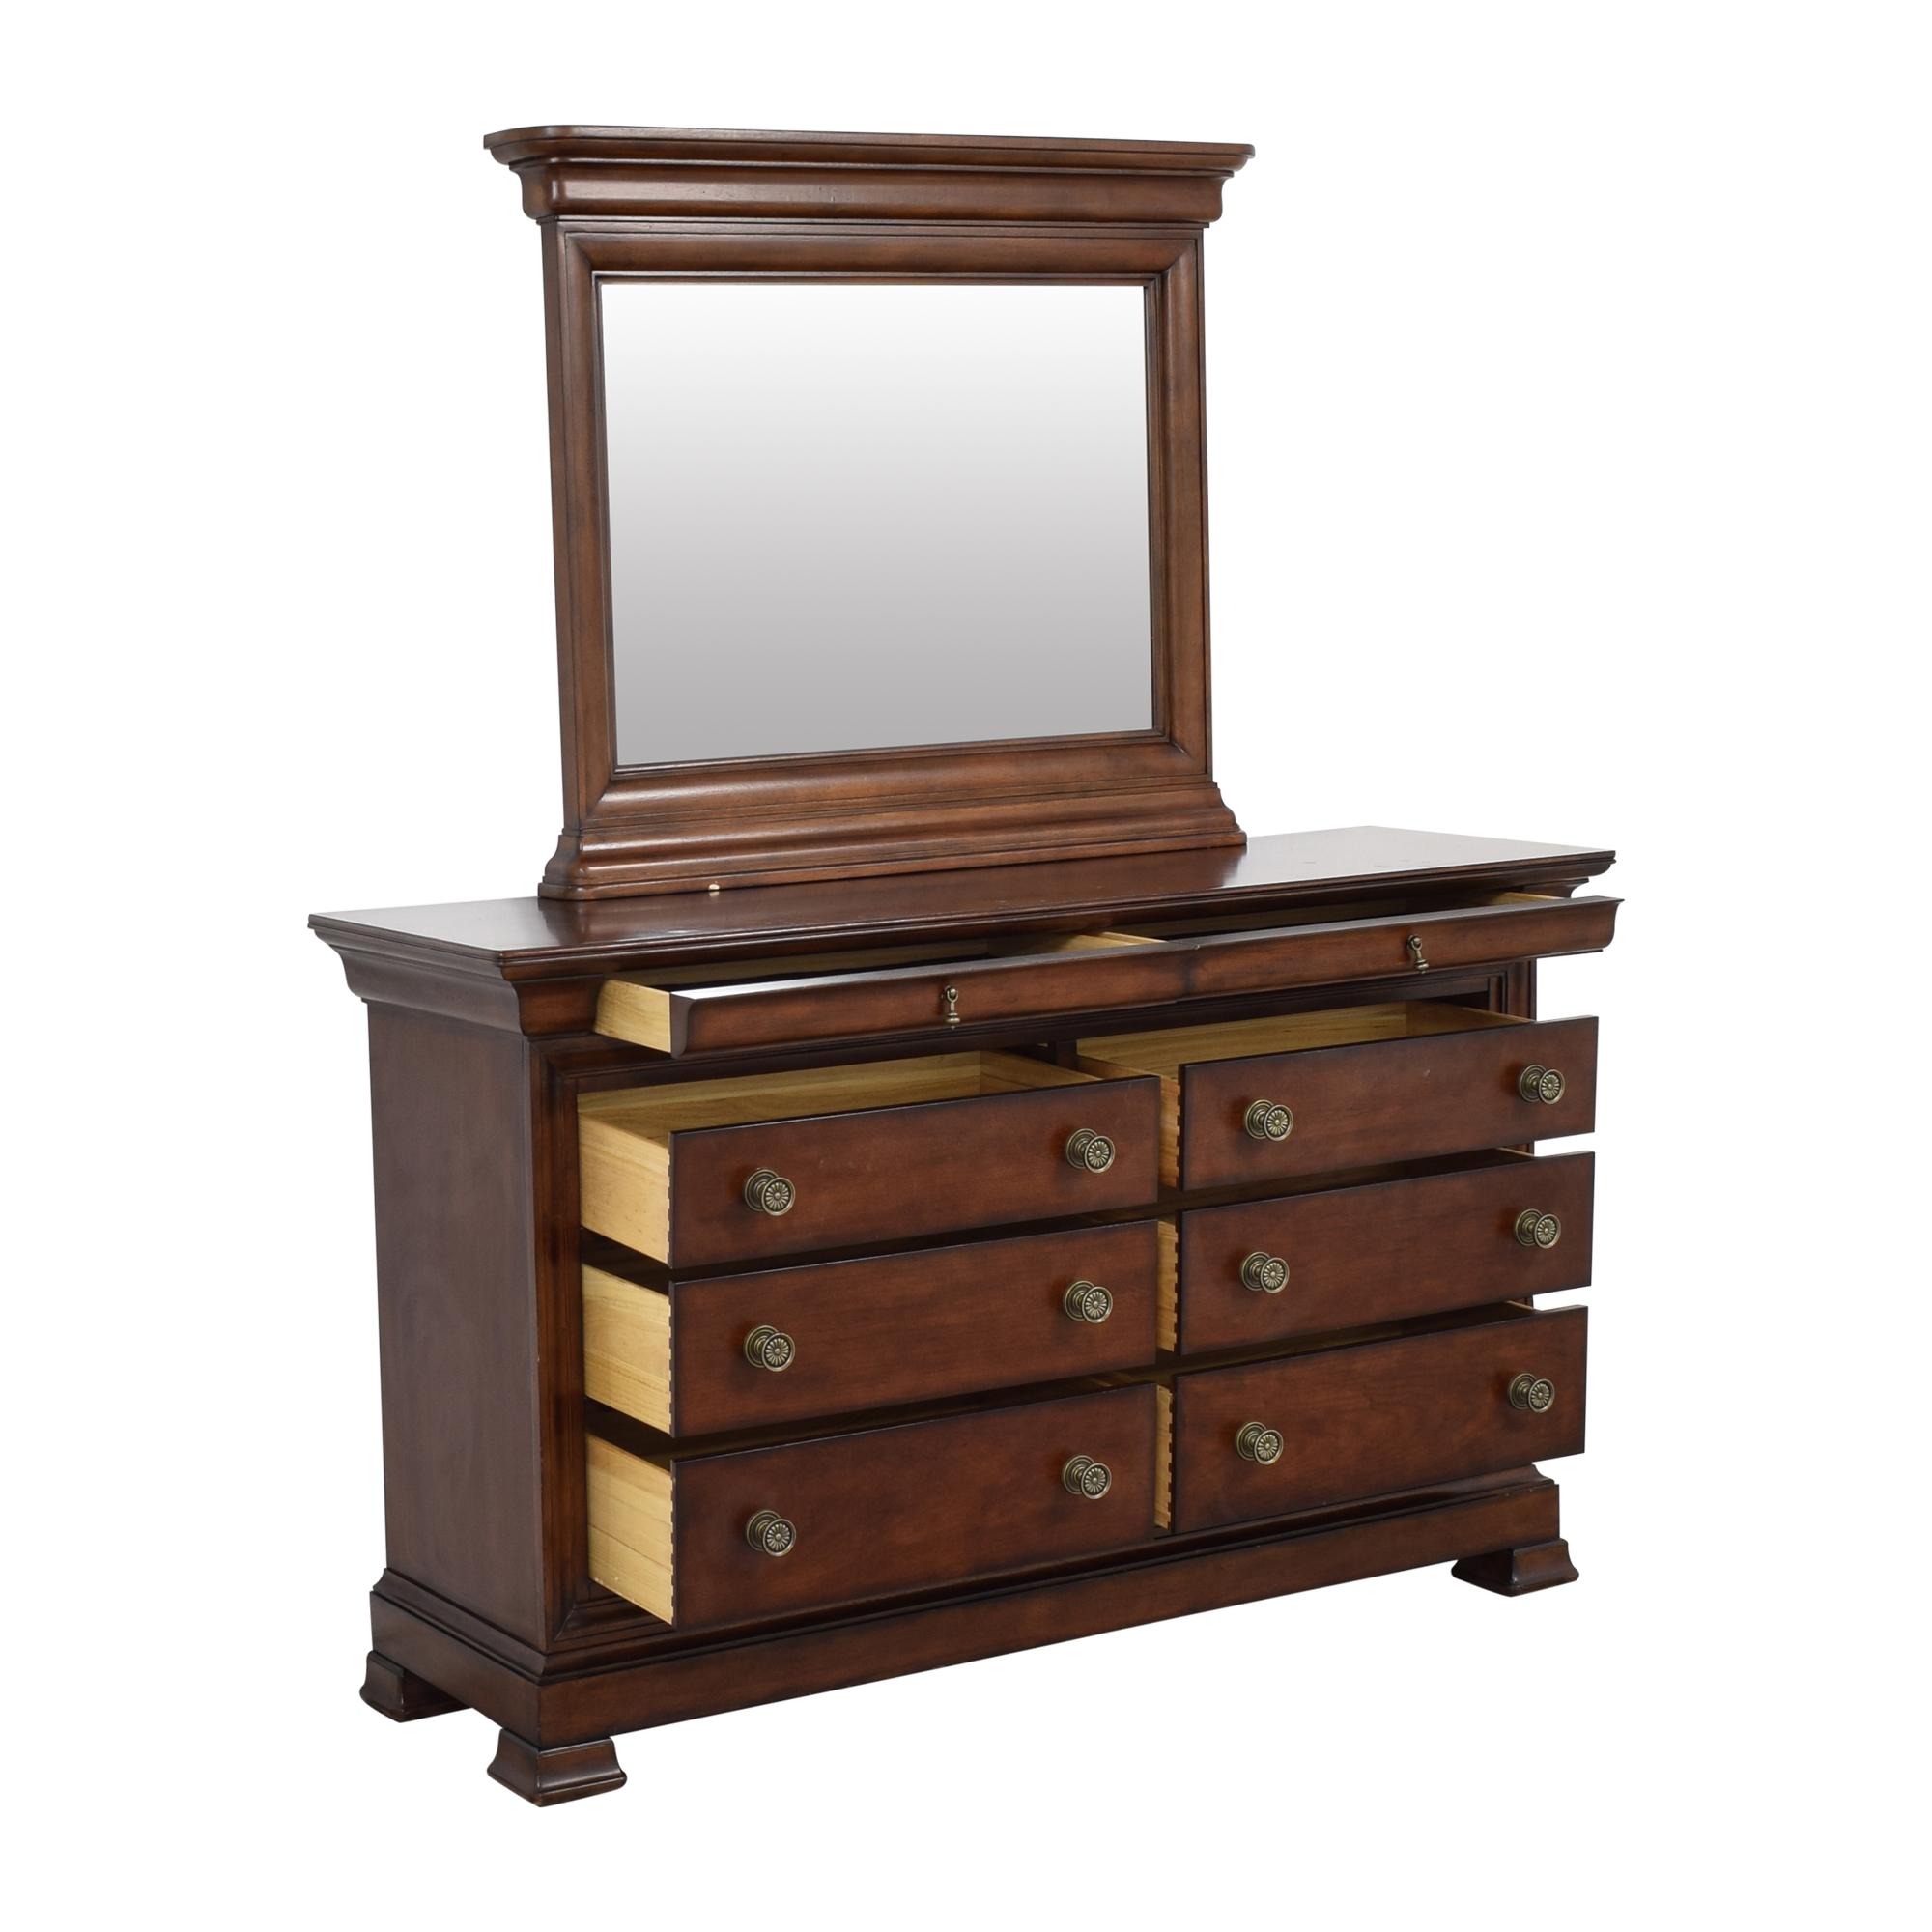 Bassett Furniture Bassett Eight Drawer Dresser with Mirror brown